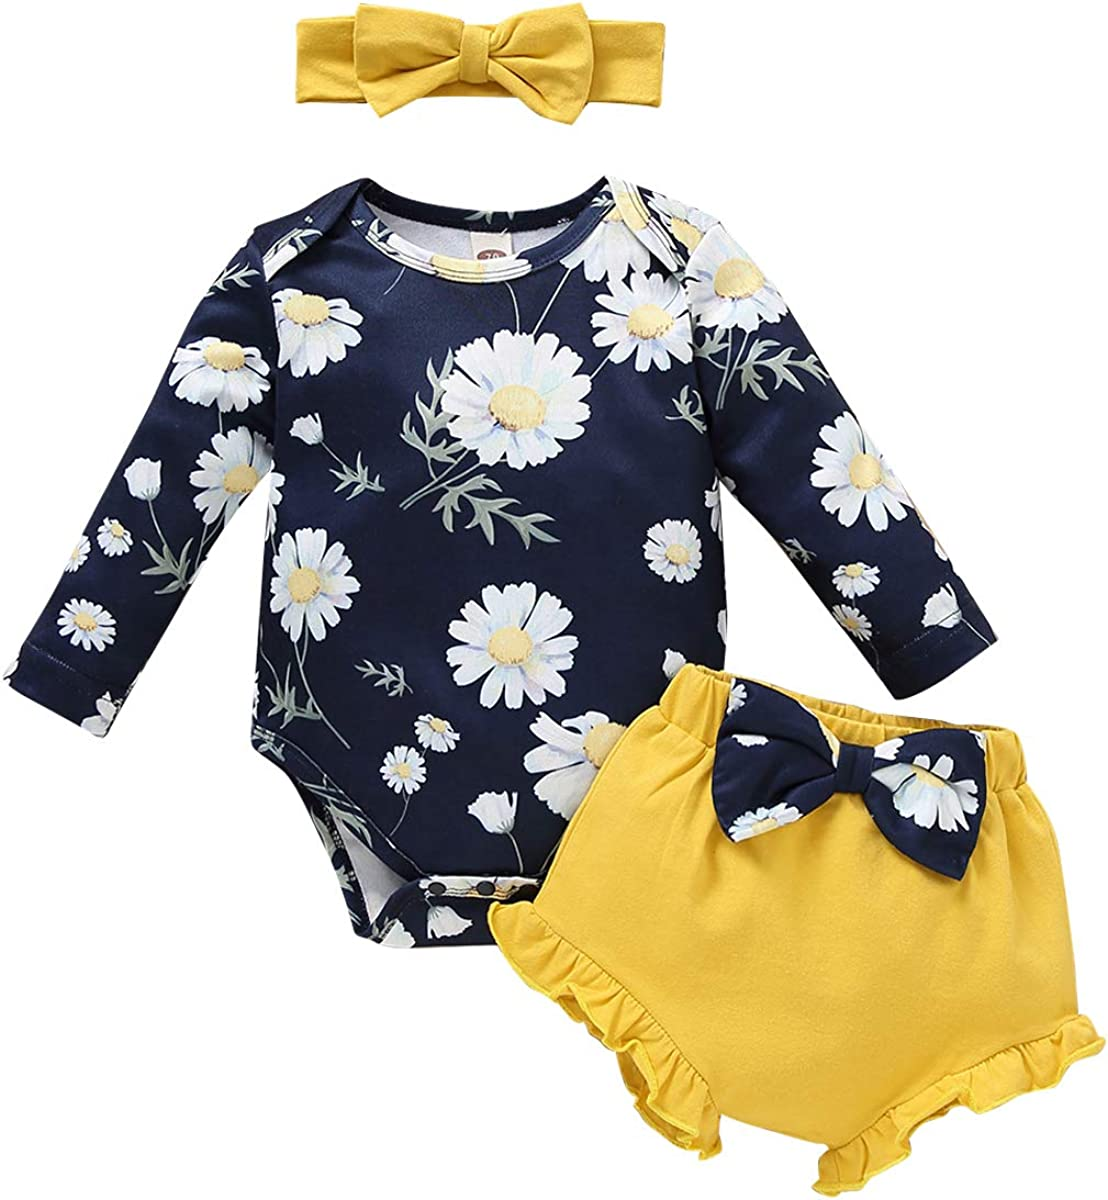 Baby Girls Boys Tie Dye Outfit Romper Top Pants Pajamas Set Ribbed Newborn Ruffle Long Sleeve Sleepwear Lounge Clothes